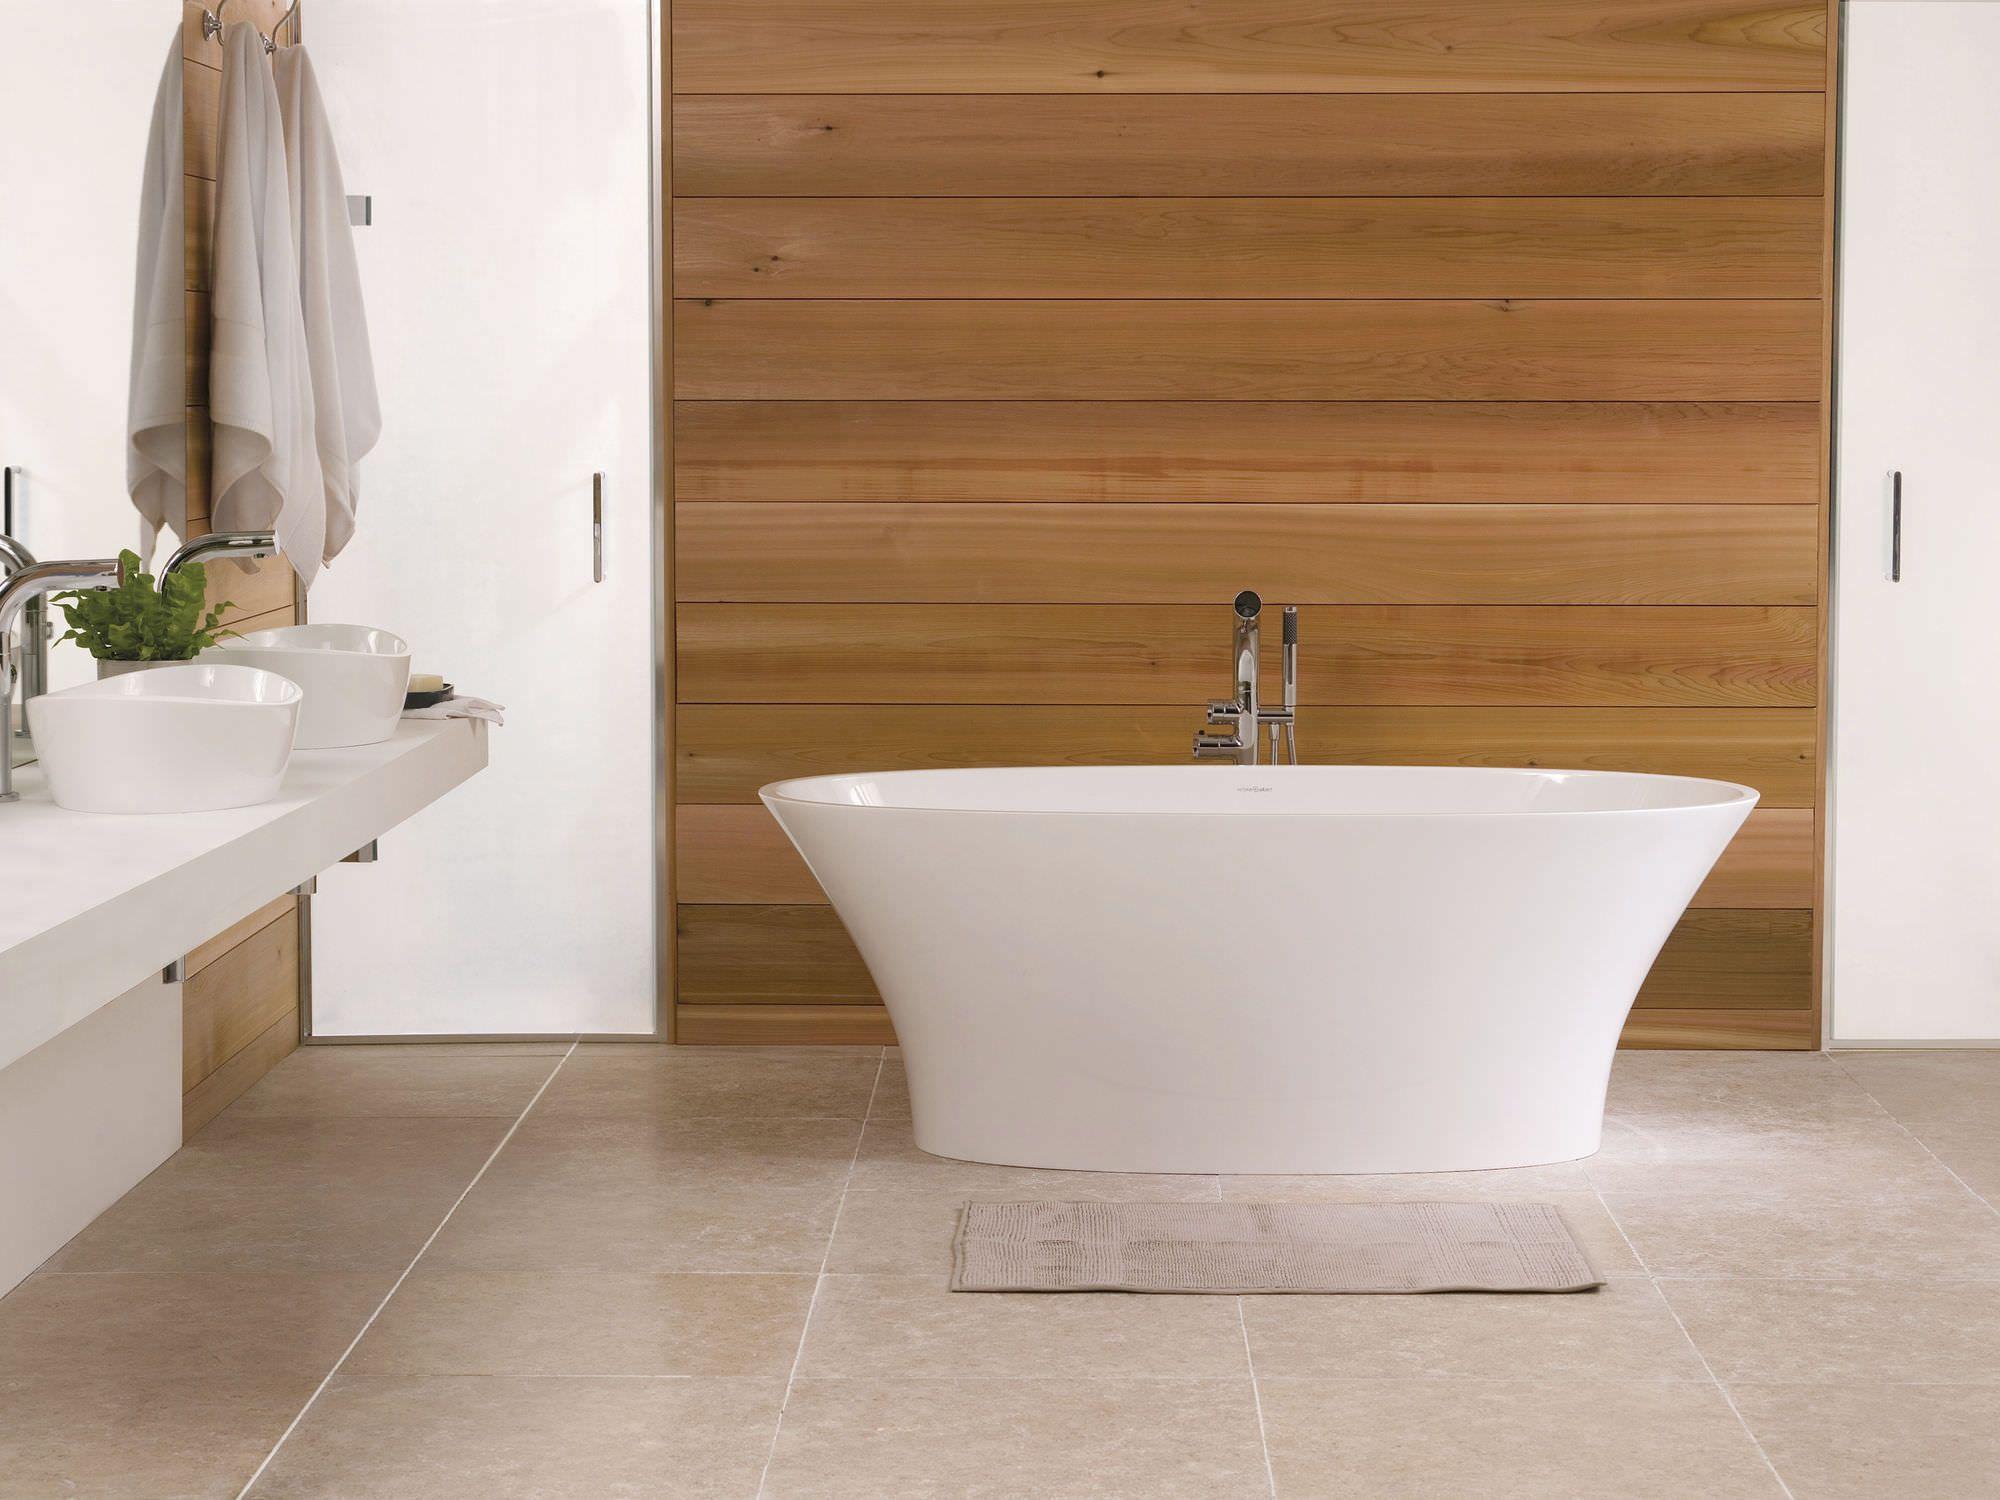 Freestanding bathtub / oval / stone resin IONIAN Victoria + Albert ...